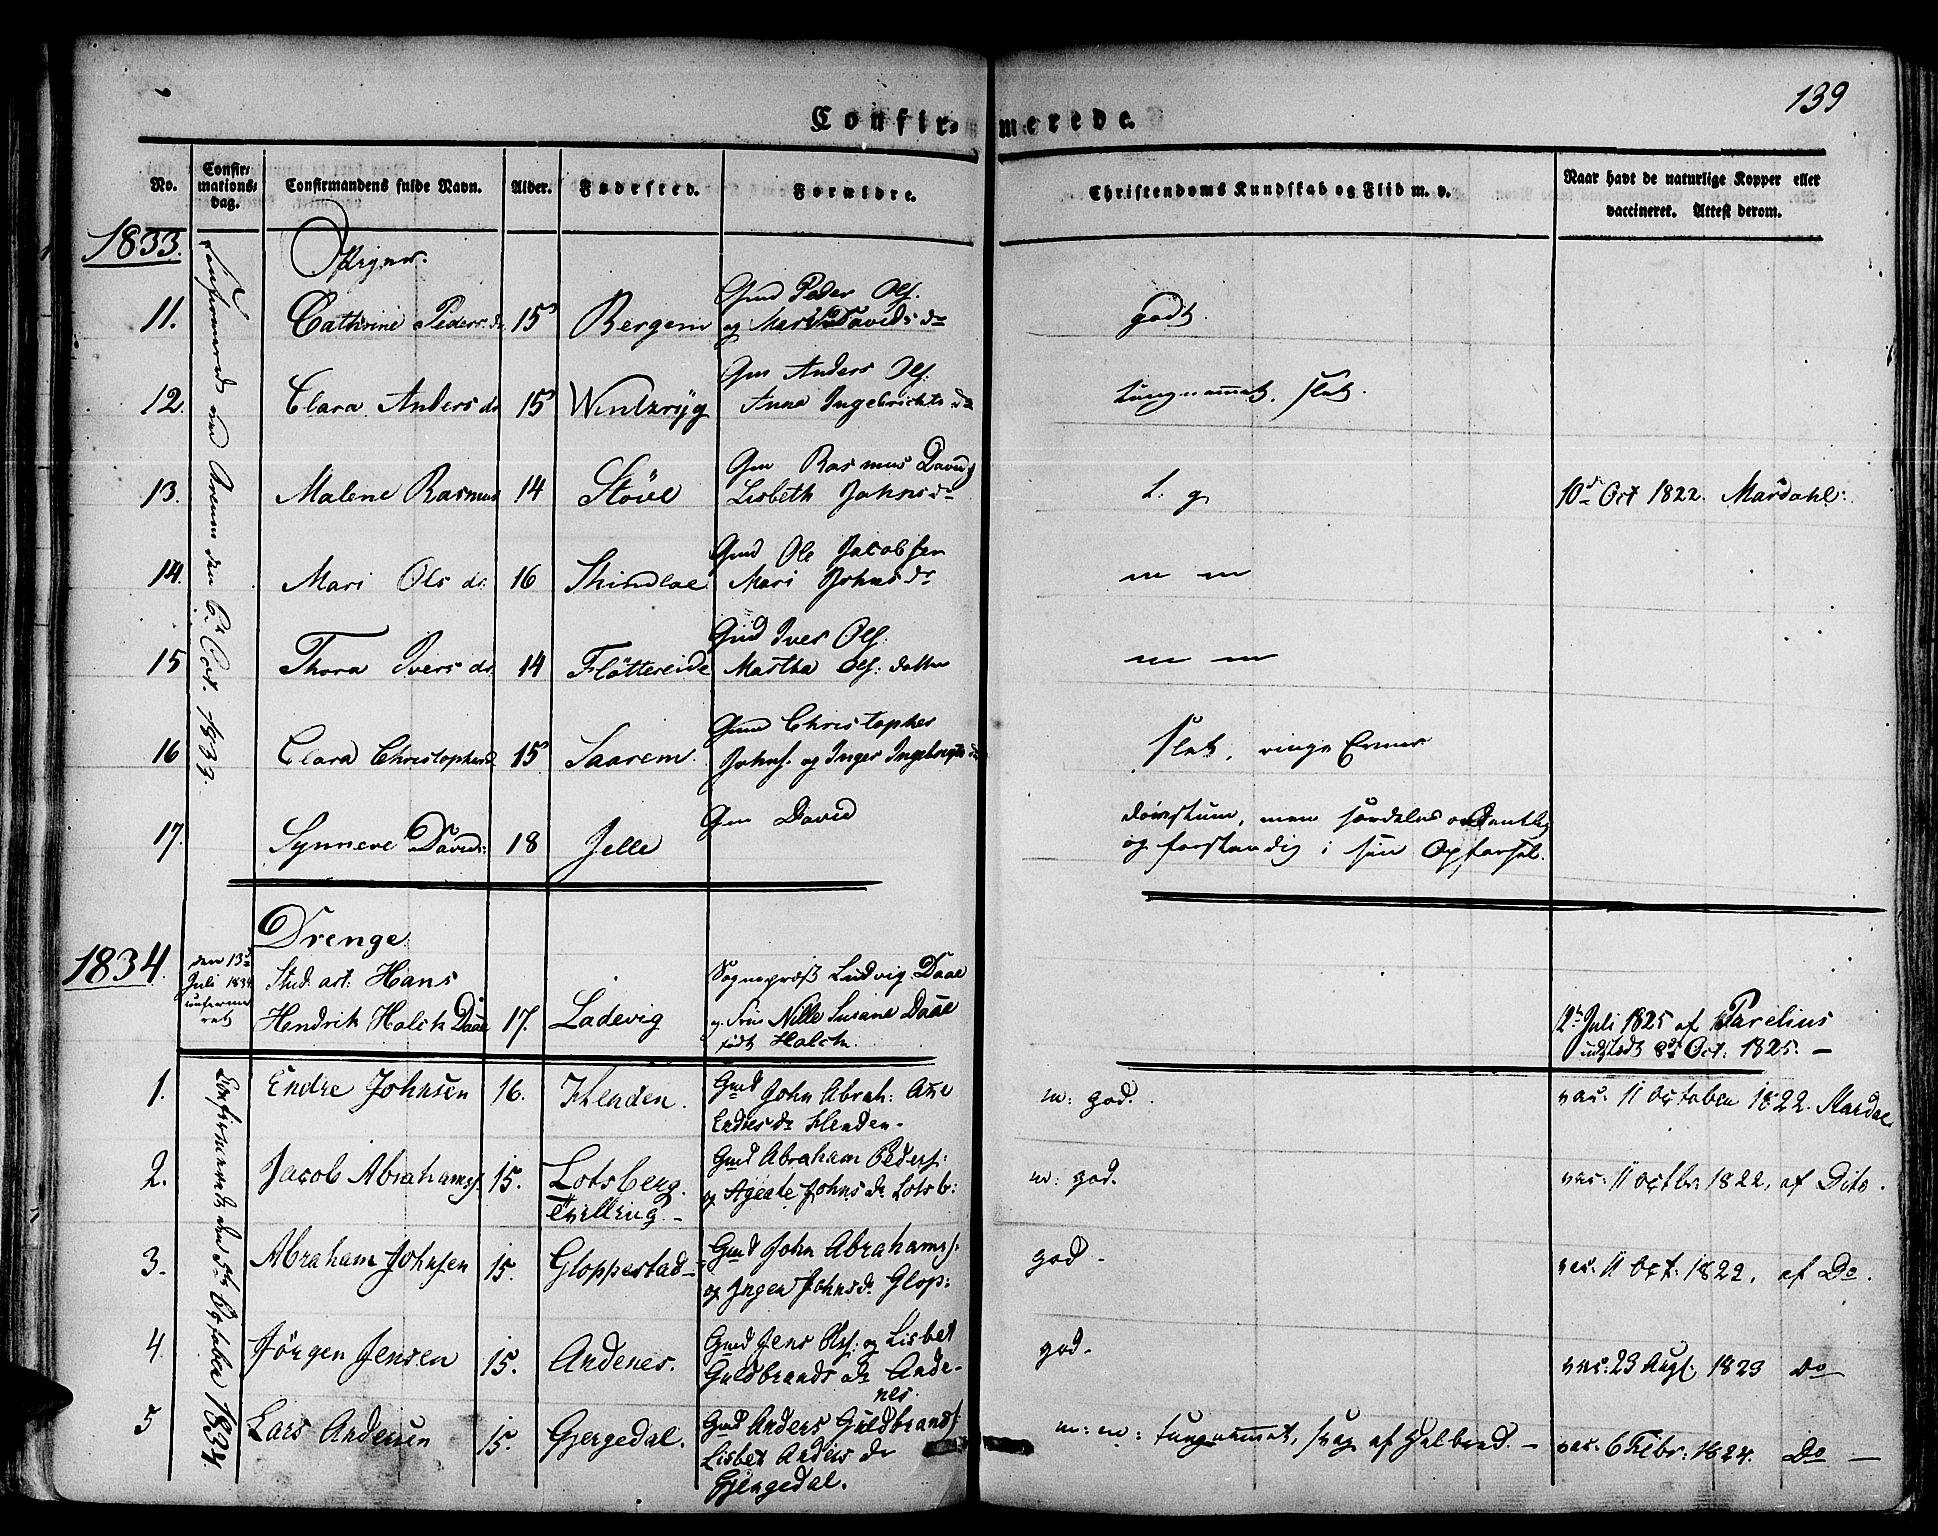 SAB, Gloppen Sokneprestembete, H/Haa/Haaa/L0007: Parish register (official) no. A 7, 1827-1837, p. 139